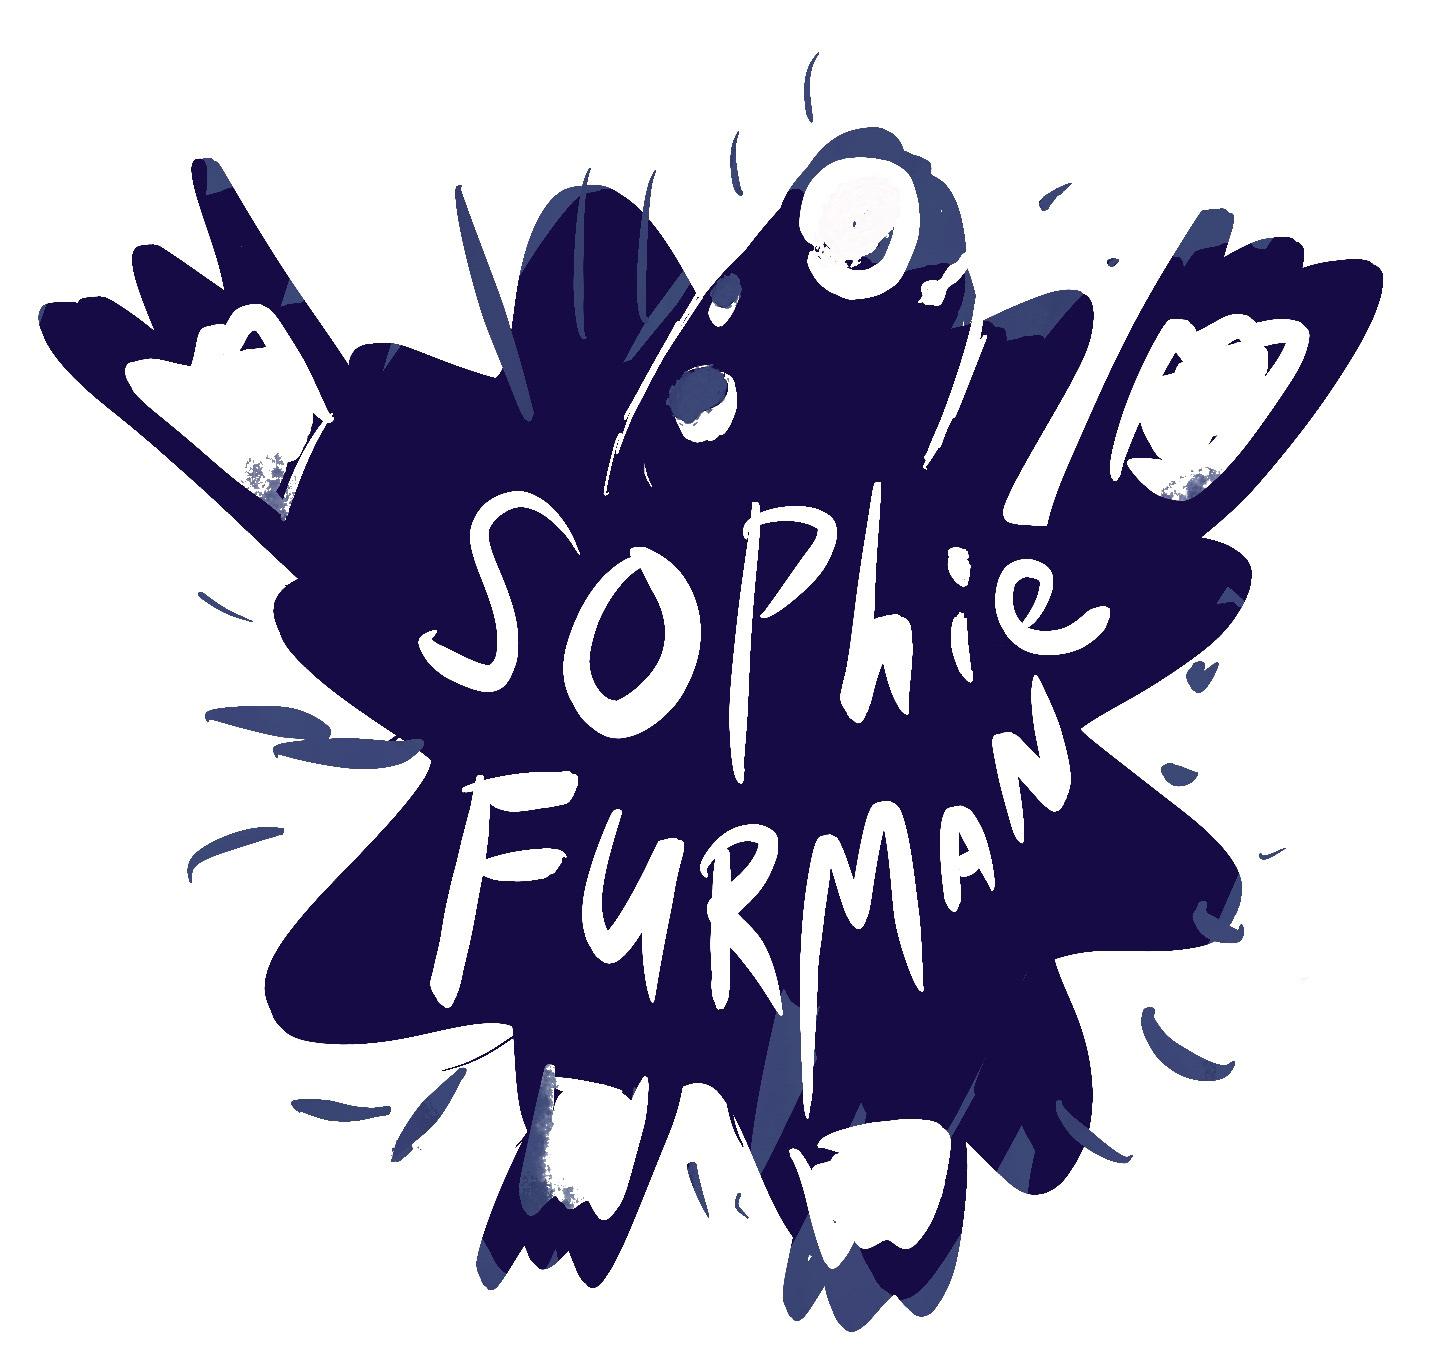 Sophie Furman